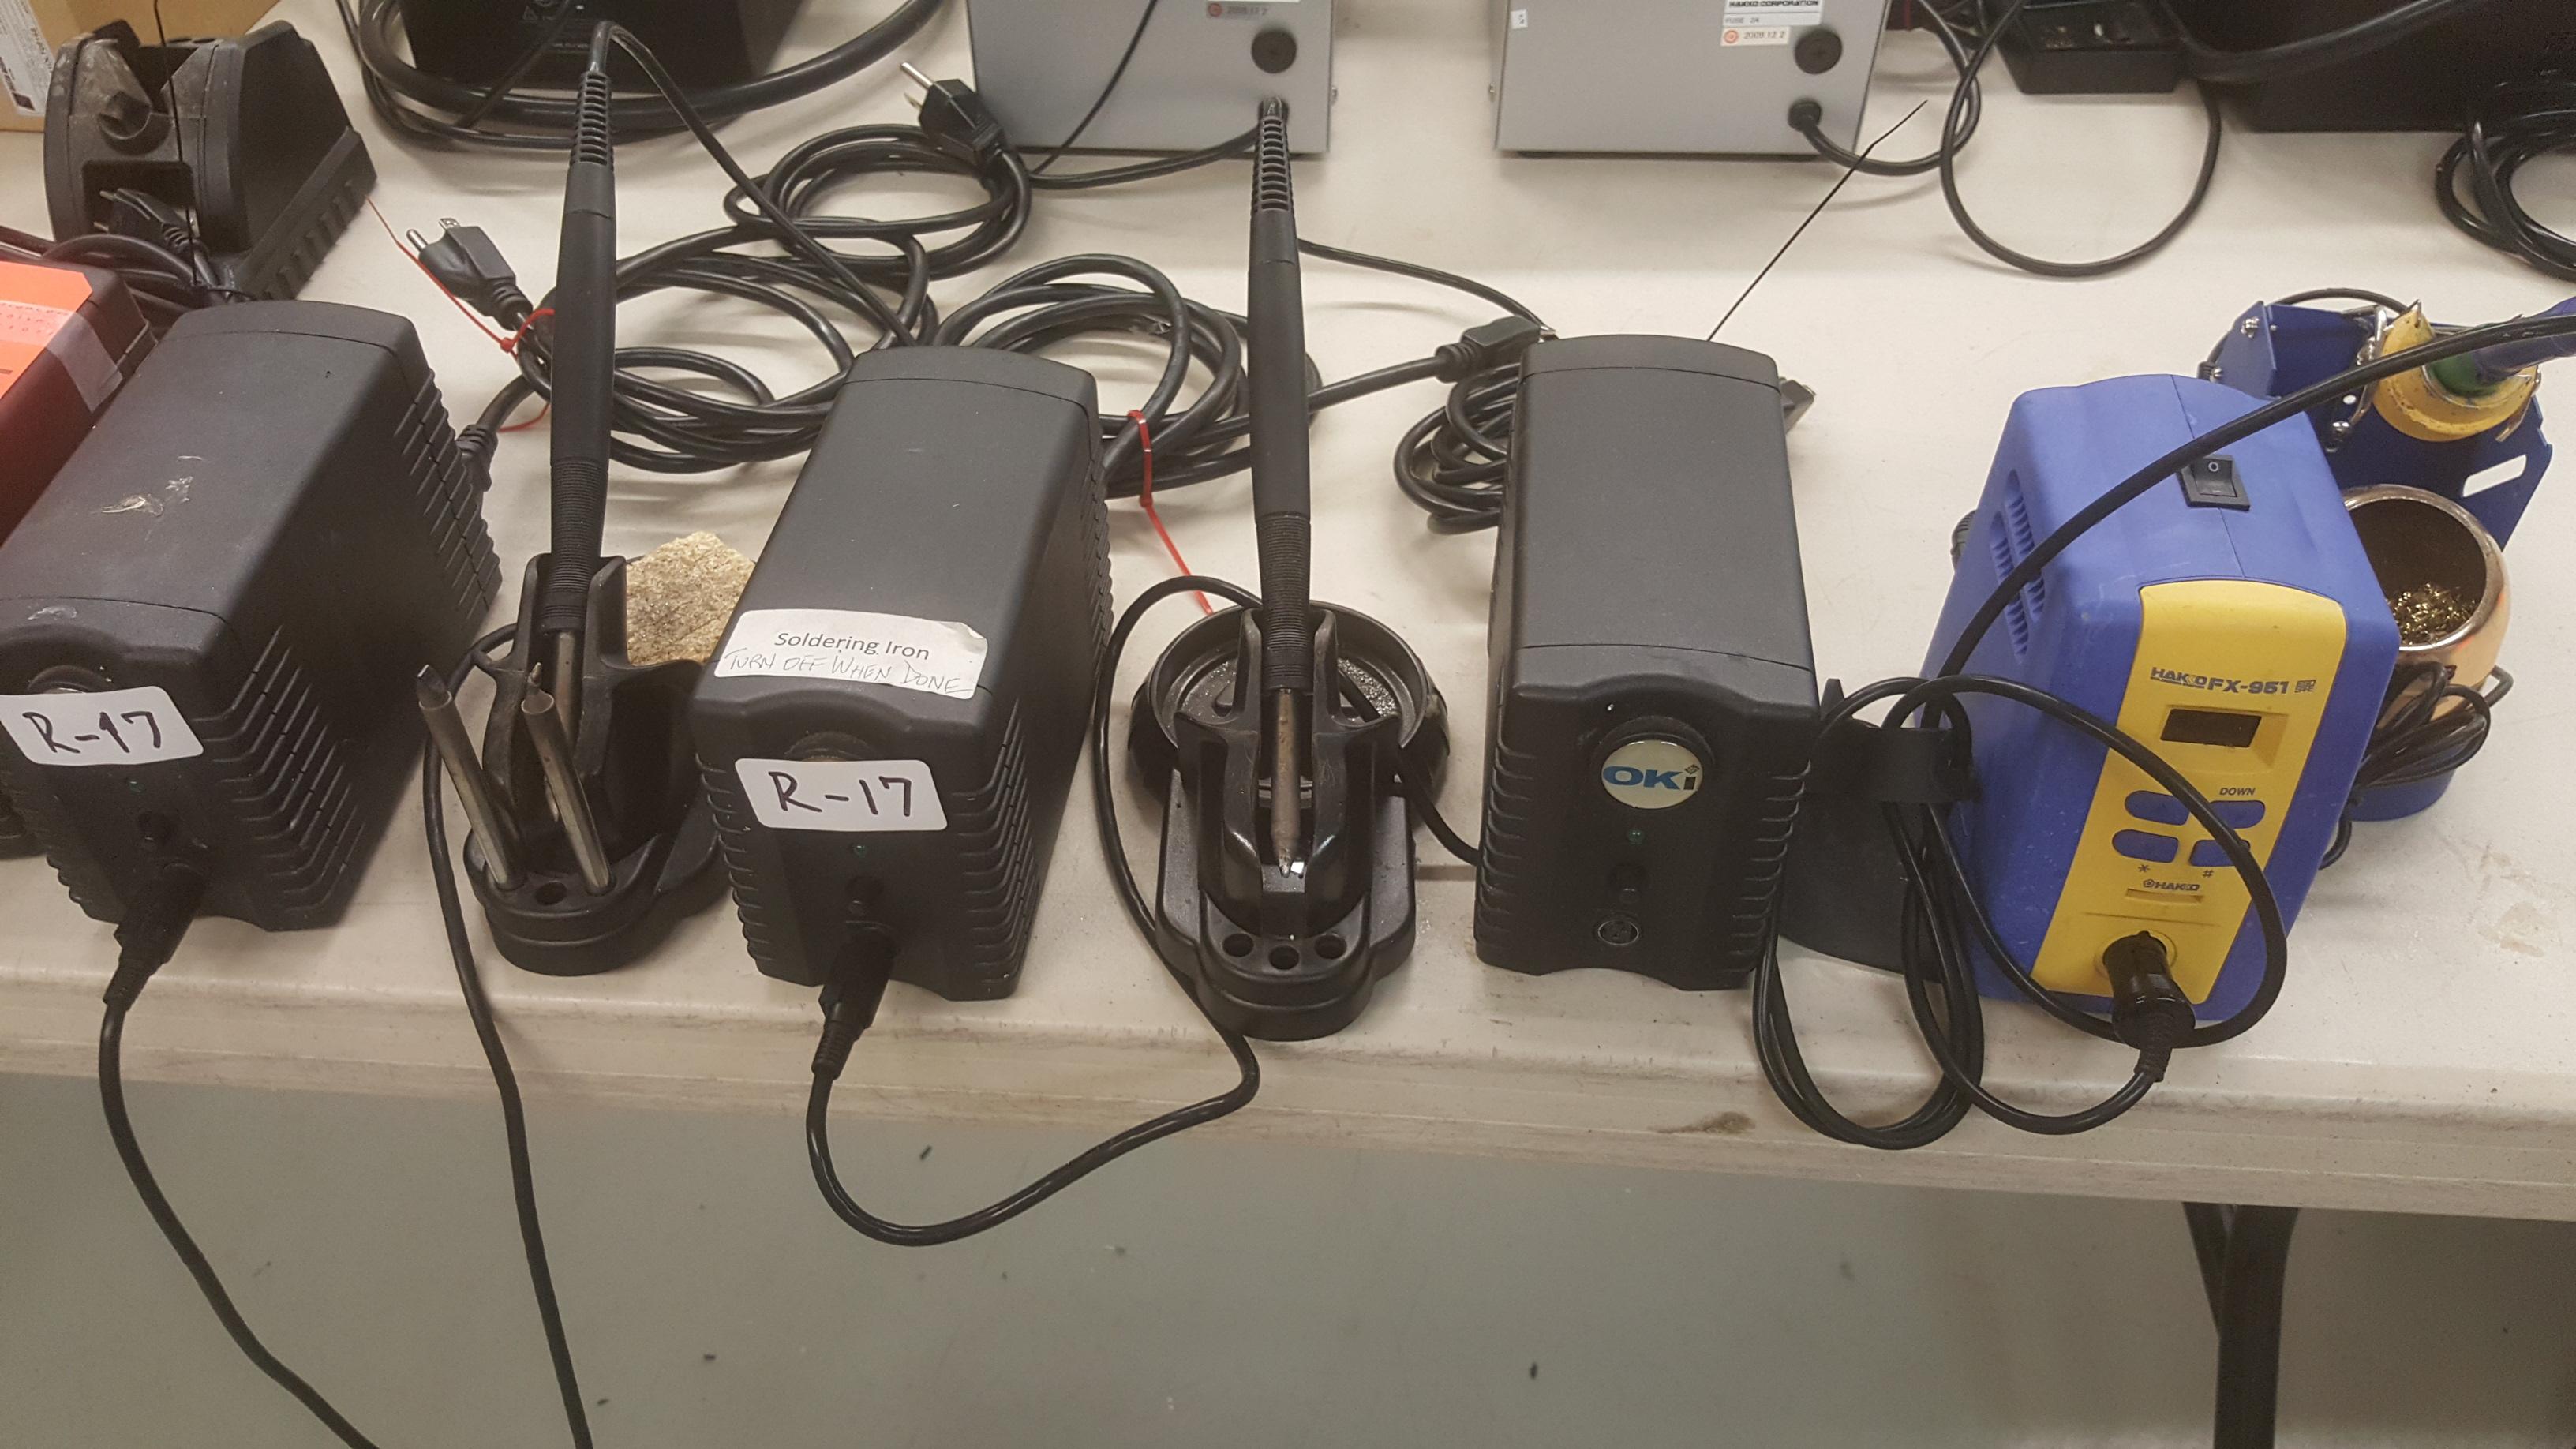 Lot 139 - (5) OKI PS-900 soldering systems, (1) HAKKO FX-951 soldering systems, (1) WELLER WE51 soldering